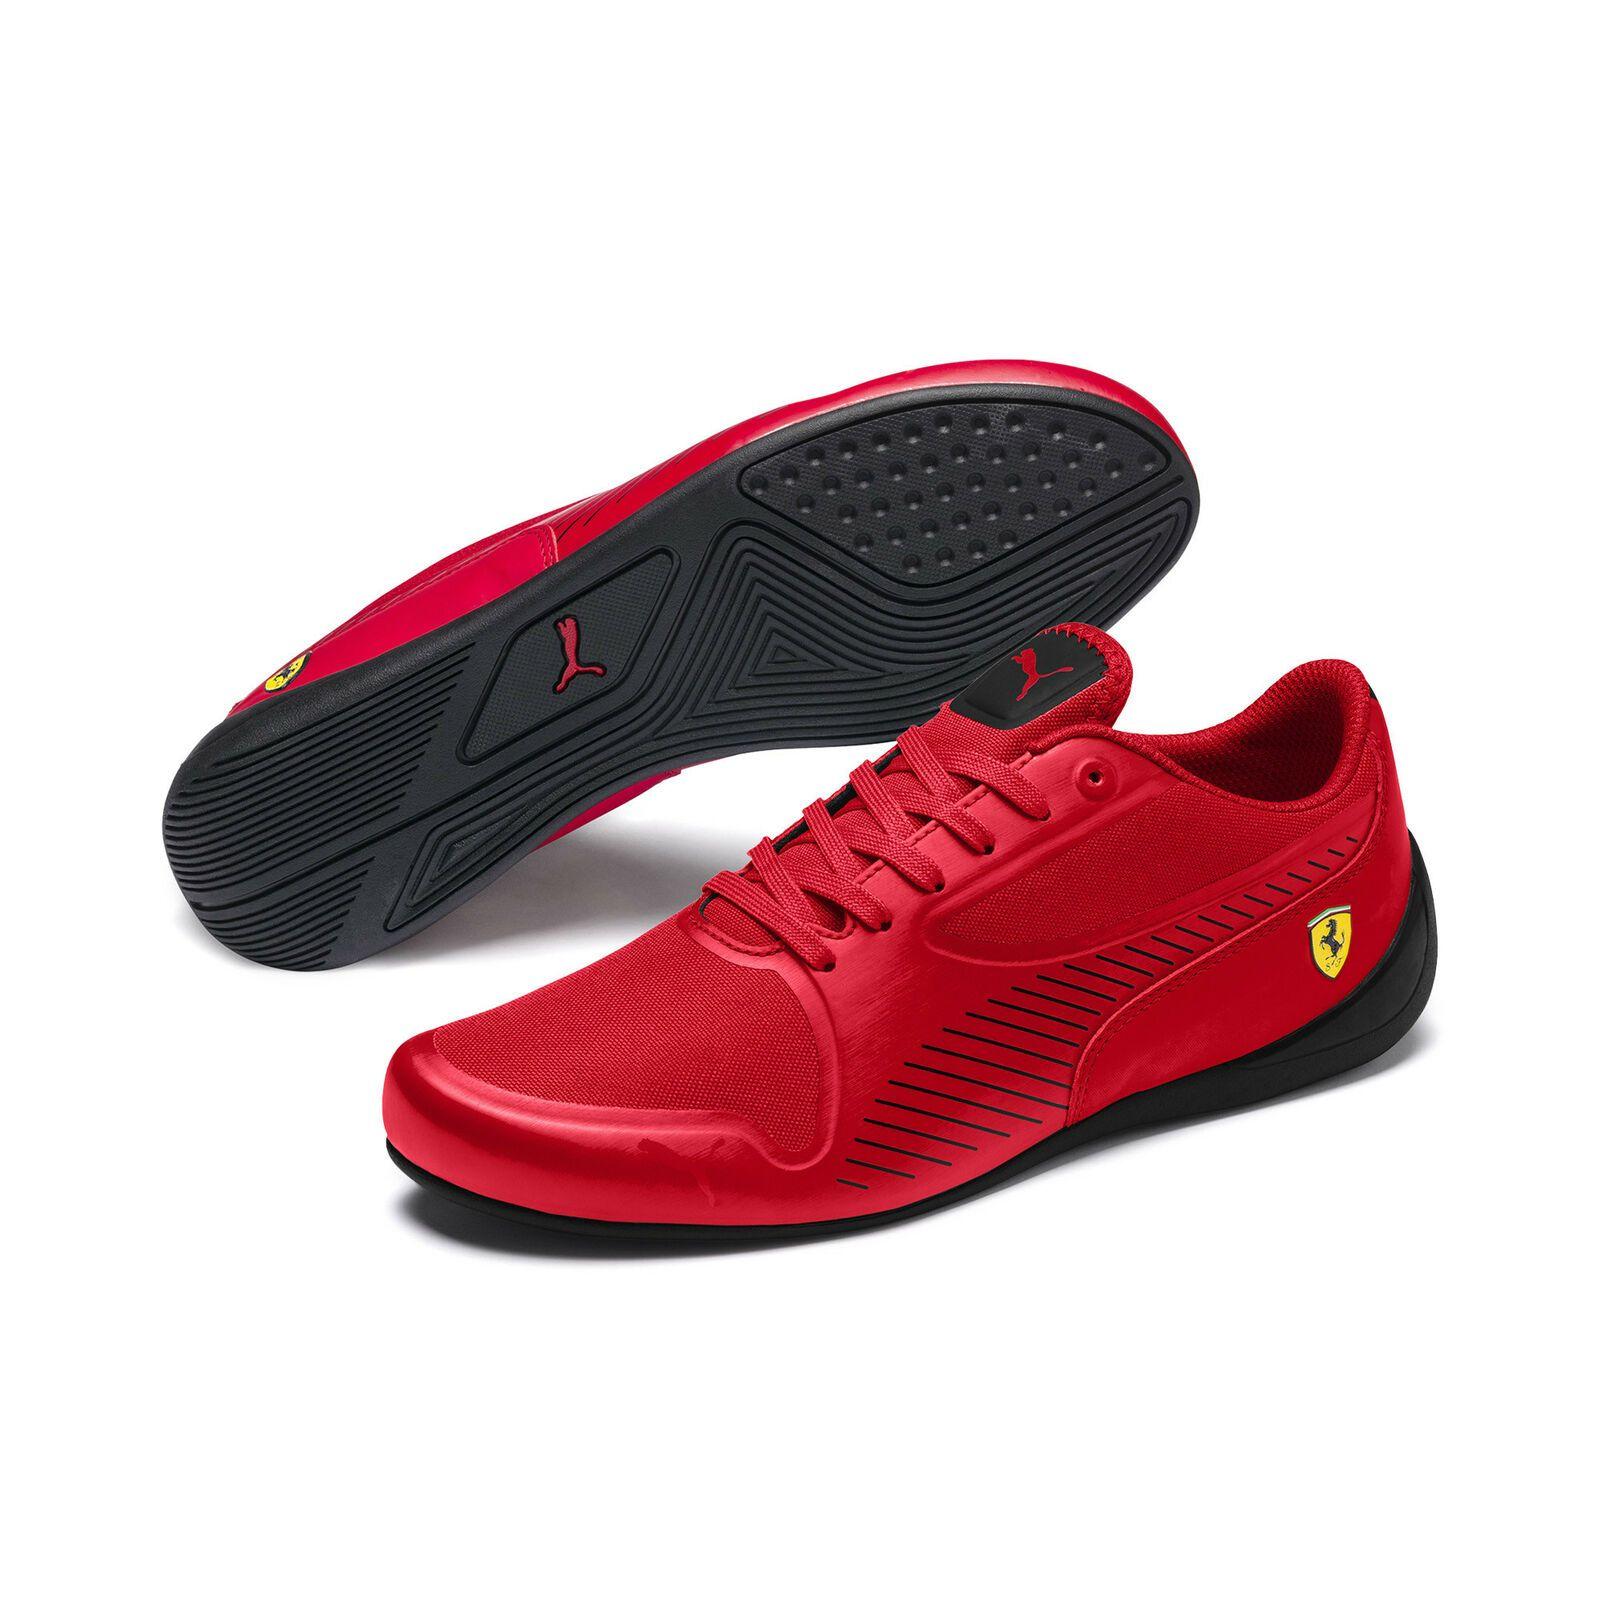 PUMA Scuderia Ferrari Drift Cat 7 Ultra Shoes Men Shoe Auto ...